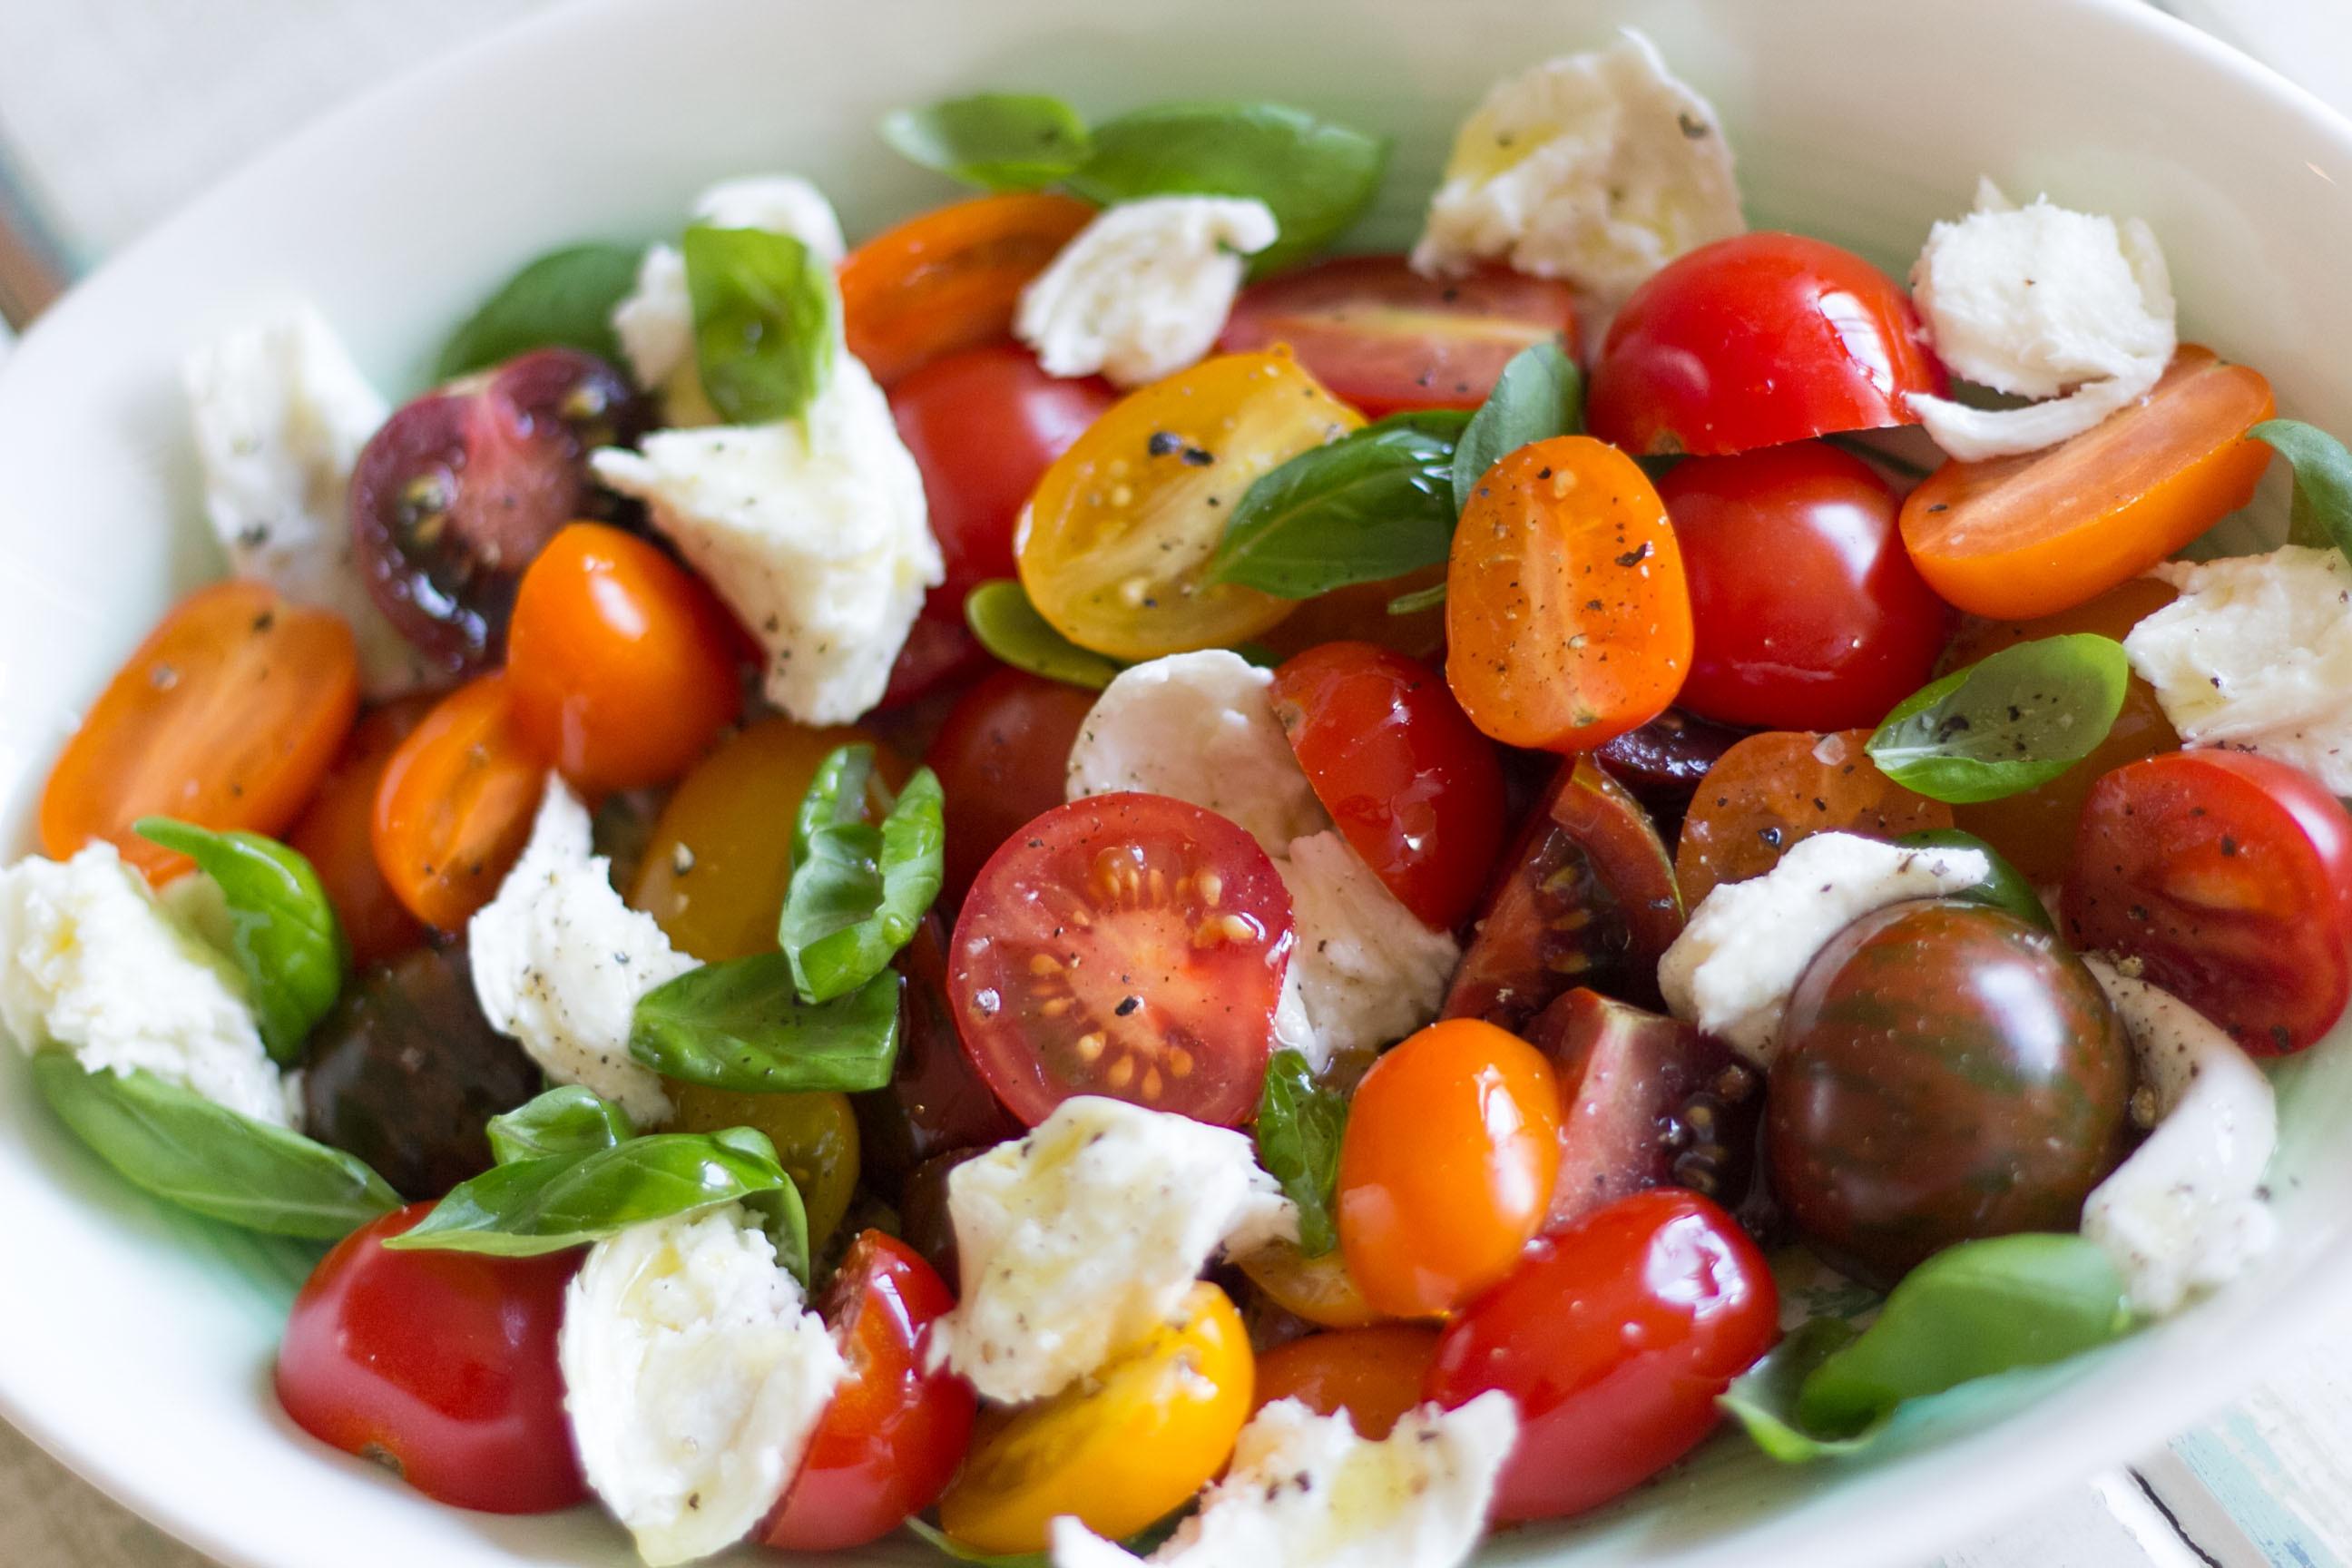 Tomato And Mozzarella Salad  tomato mozzarella salad